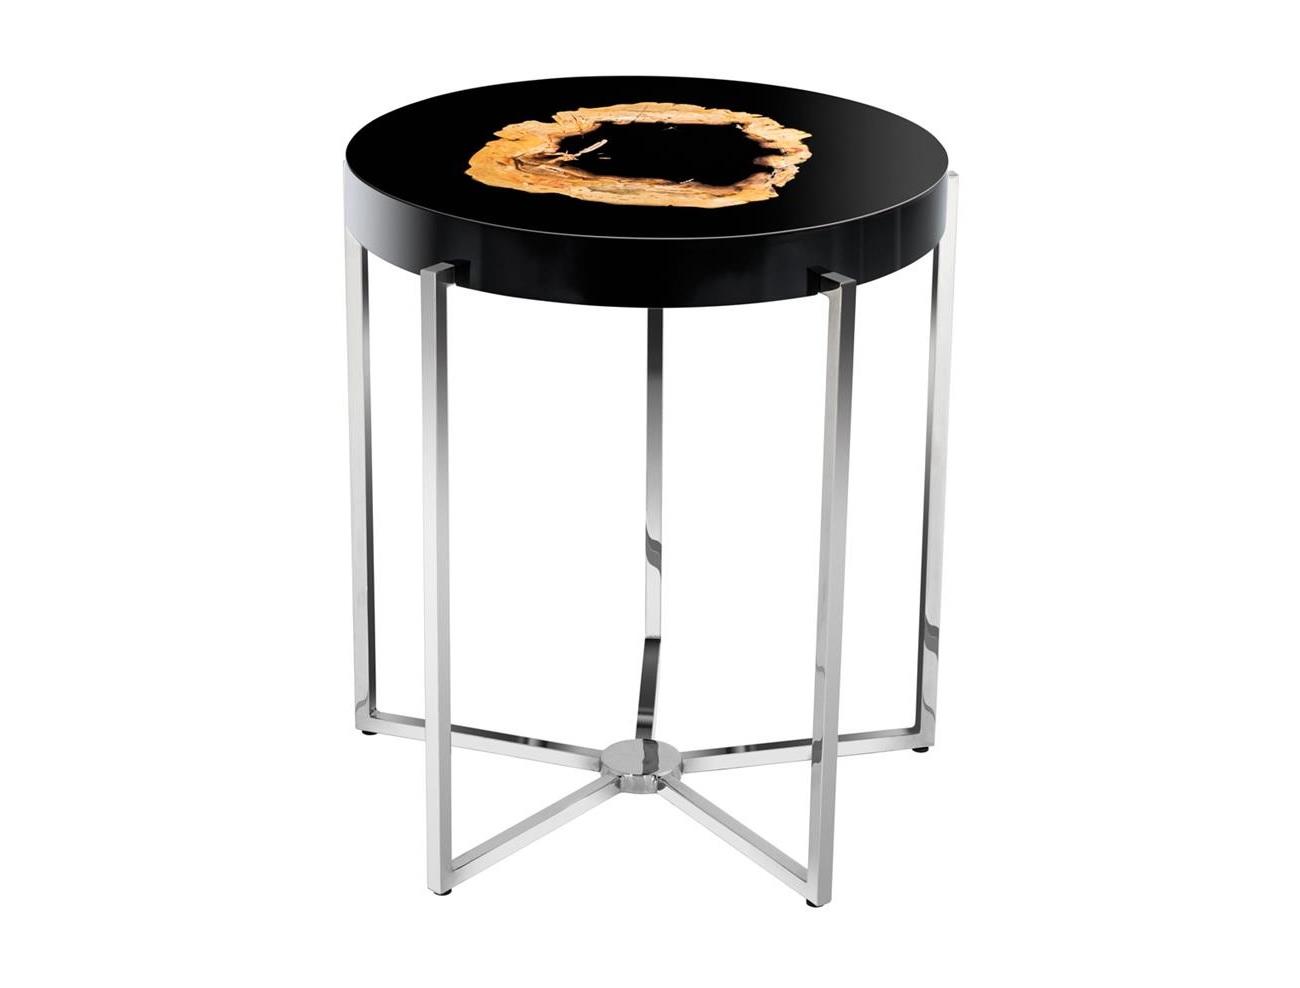 pompidou eichholtz 51x56x51 the furnish. Black Bedroom Furniture Sets. Home Design Ideas